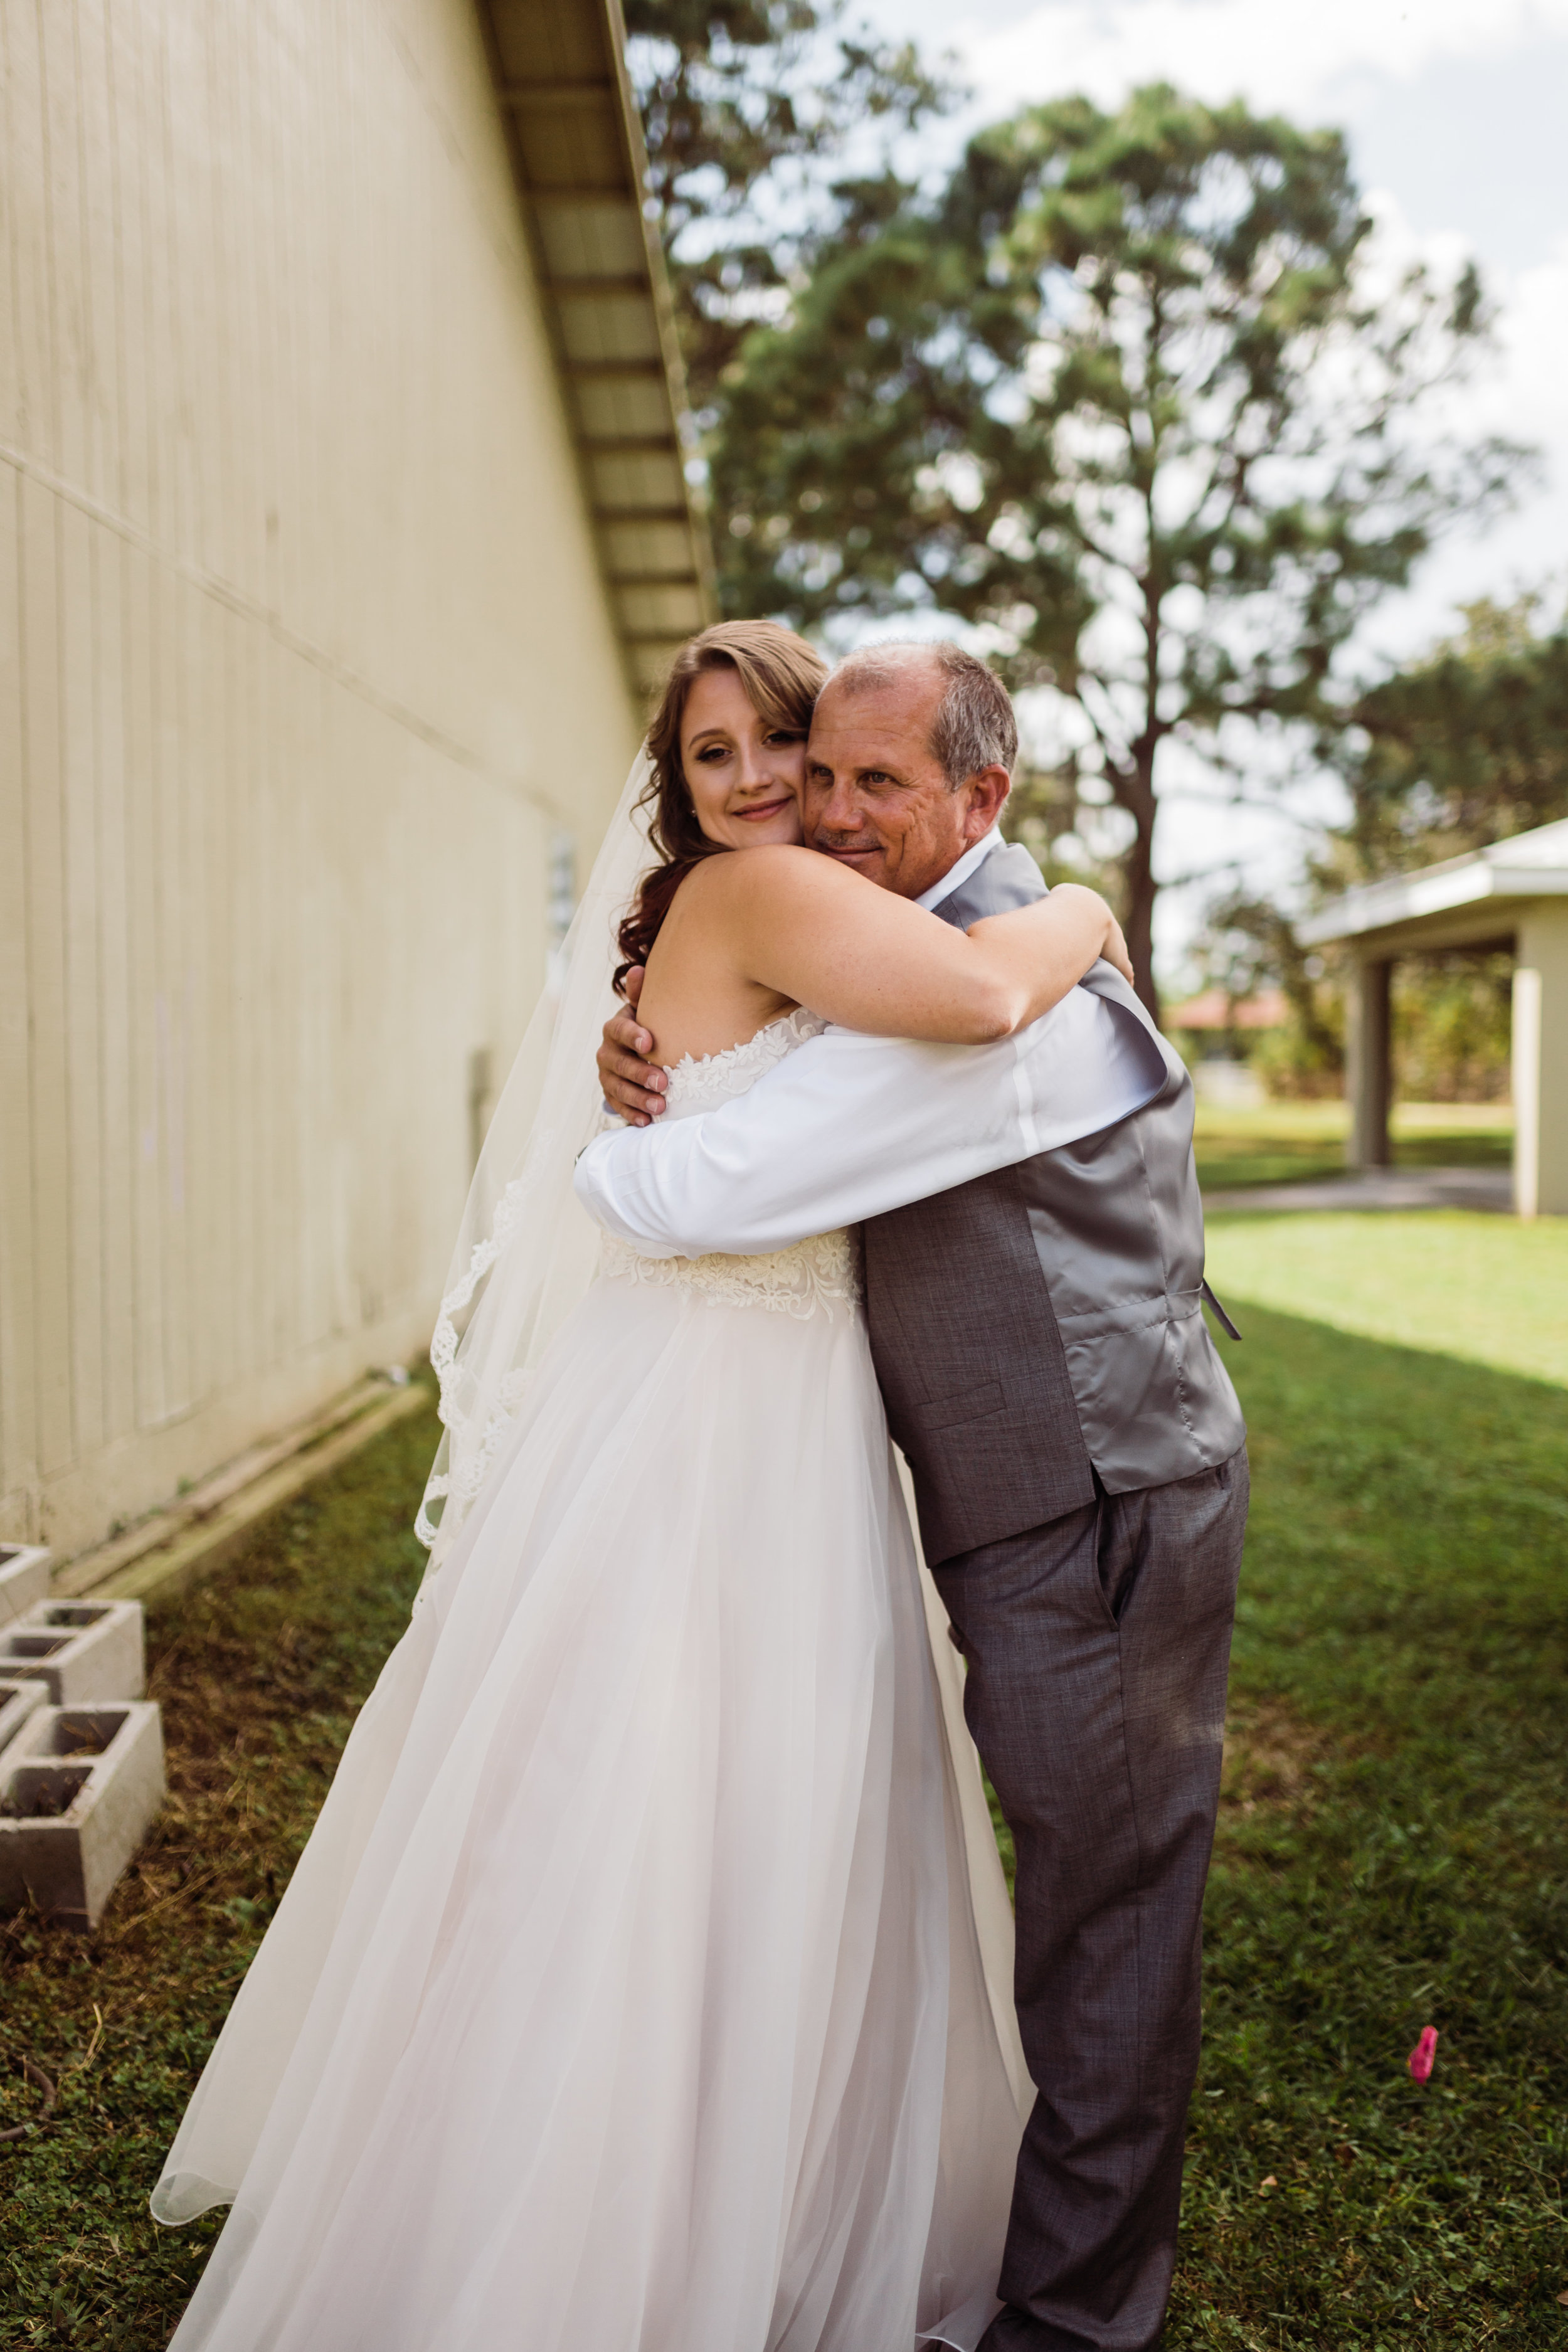 2017.10.14 Samantha and Matthew Crabtree Sarasota Wedding (93 of 708).jpg